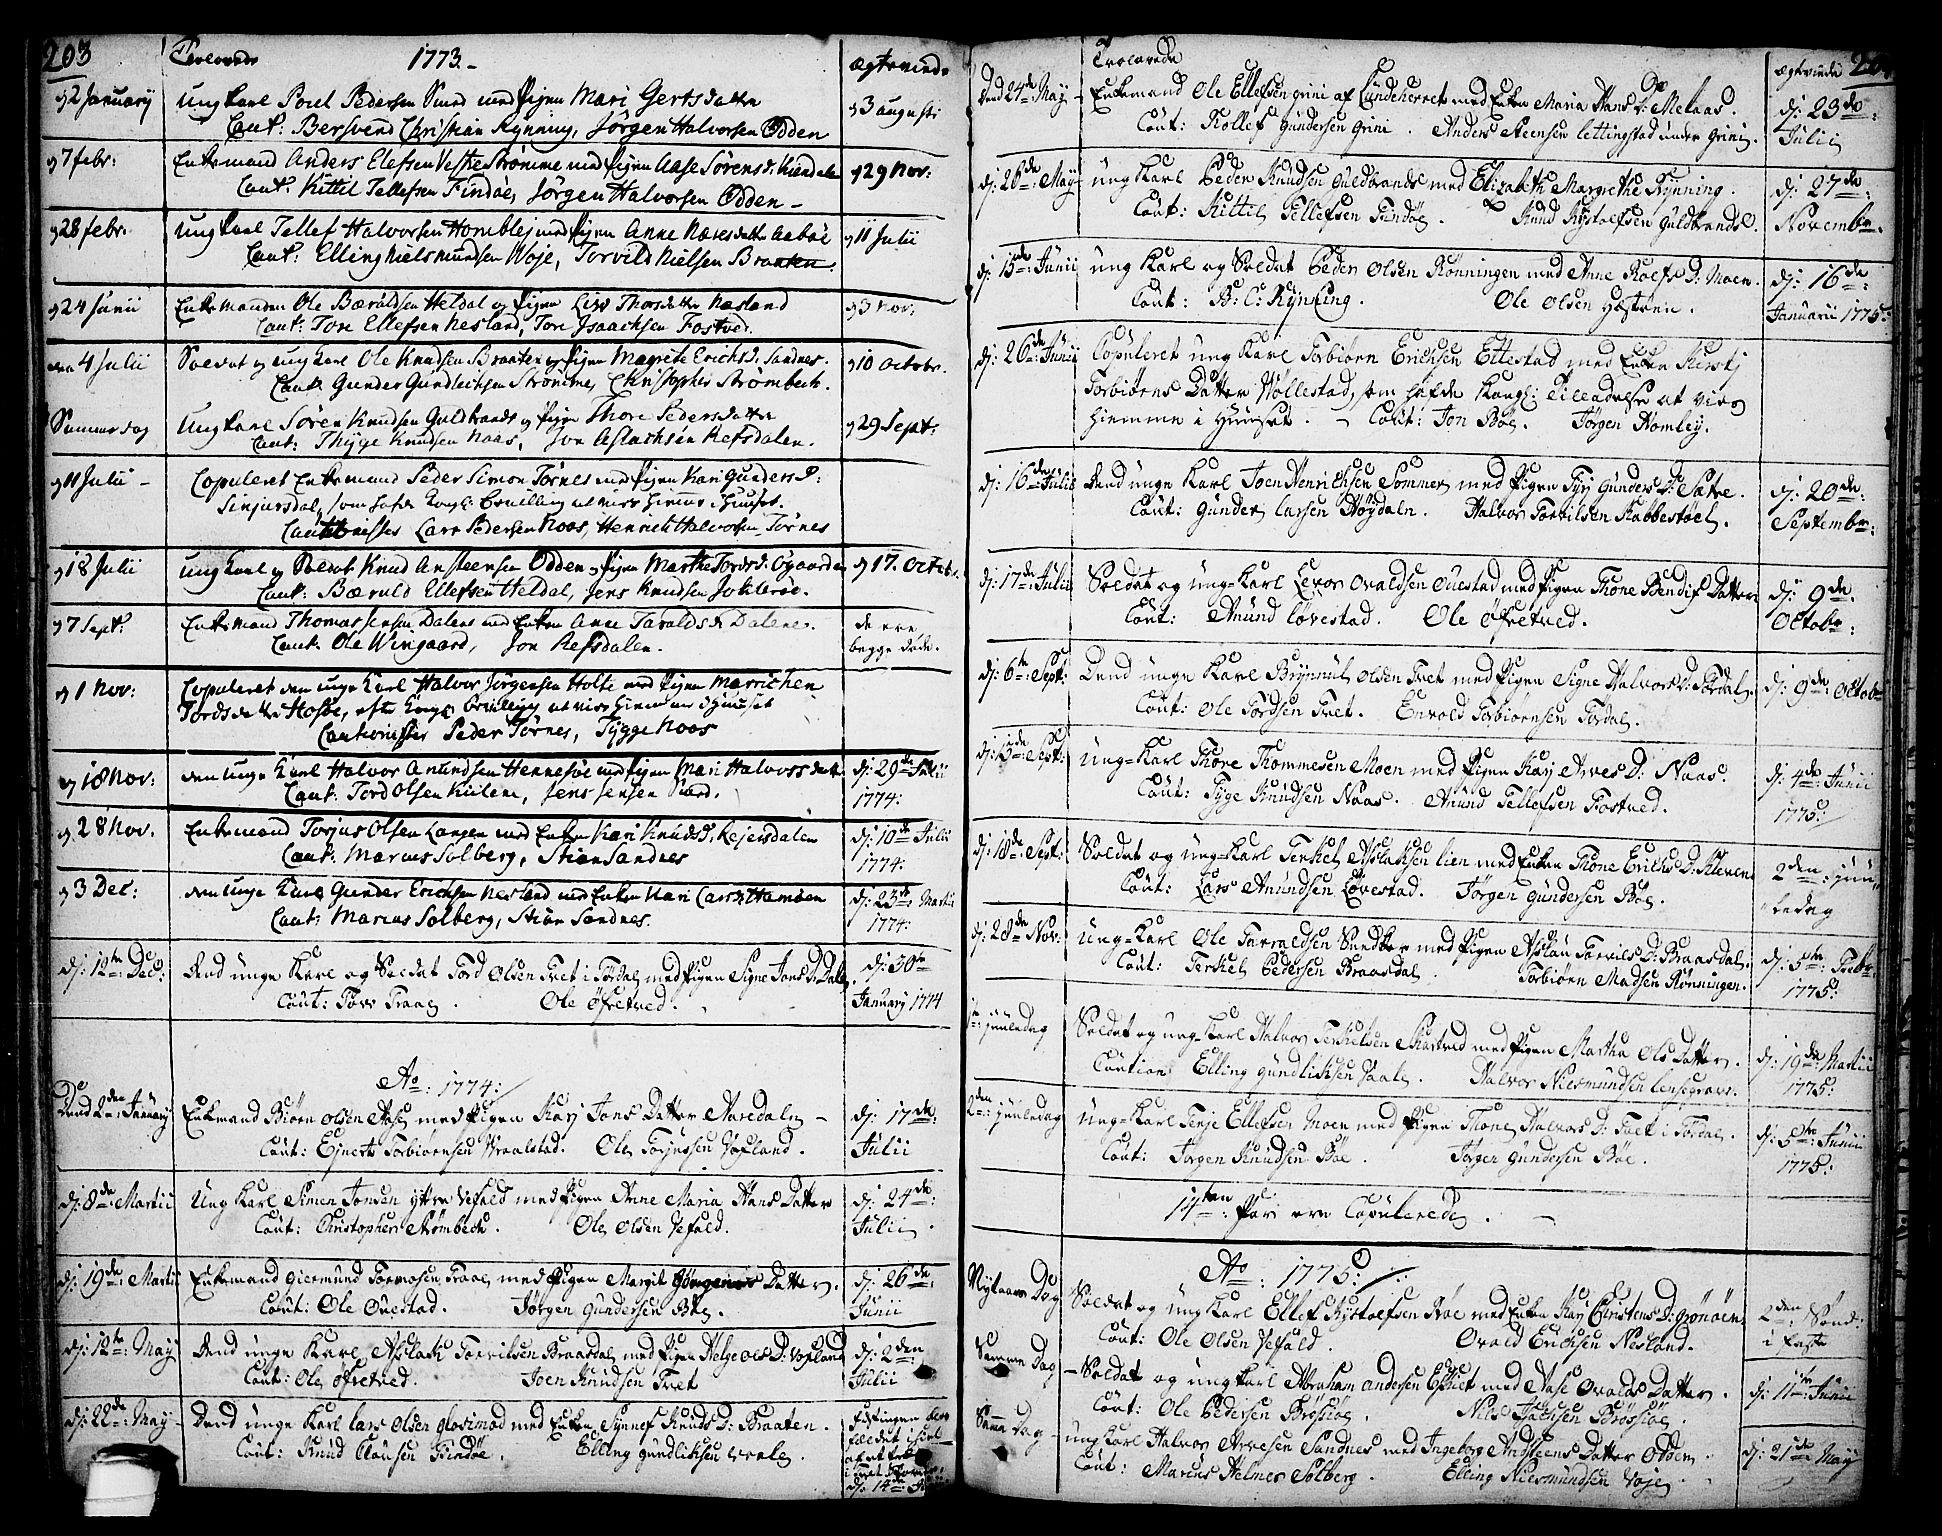 SAKO, Drangedal kirkebøker, F/Fa/L0003: Ministerialbok nr. 3, 1768-1814, s. 203-204